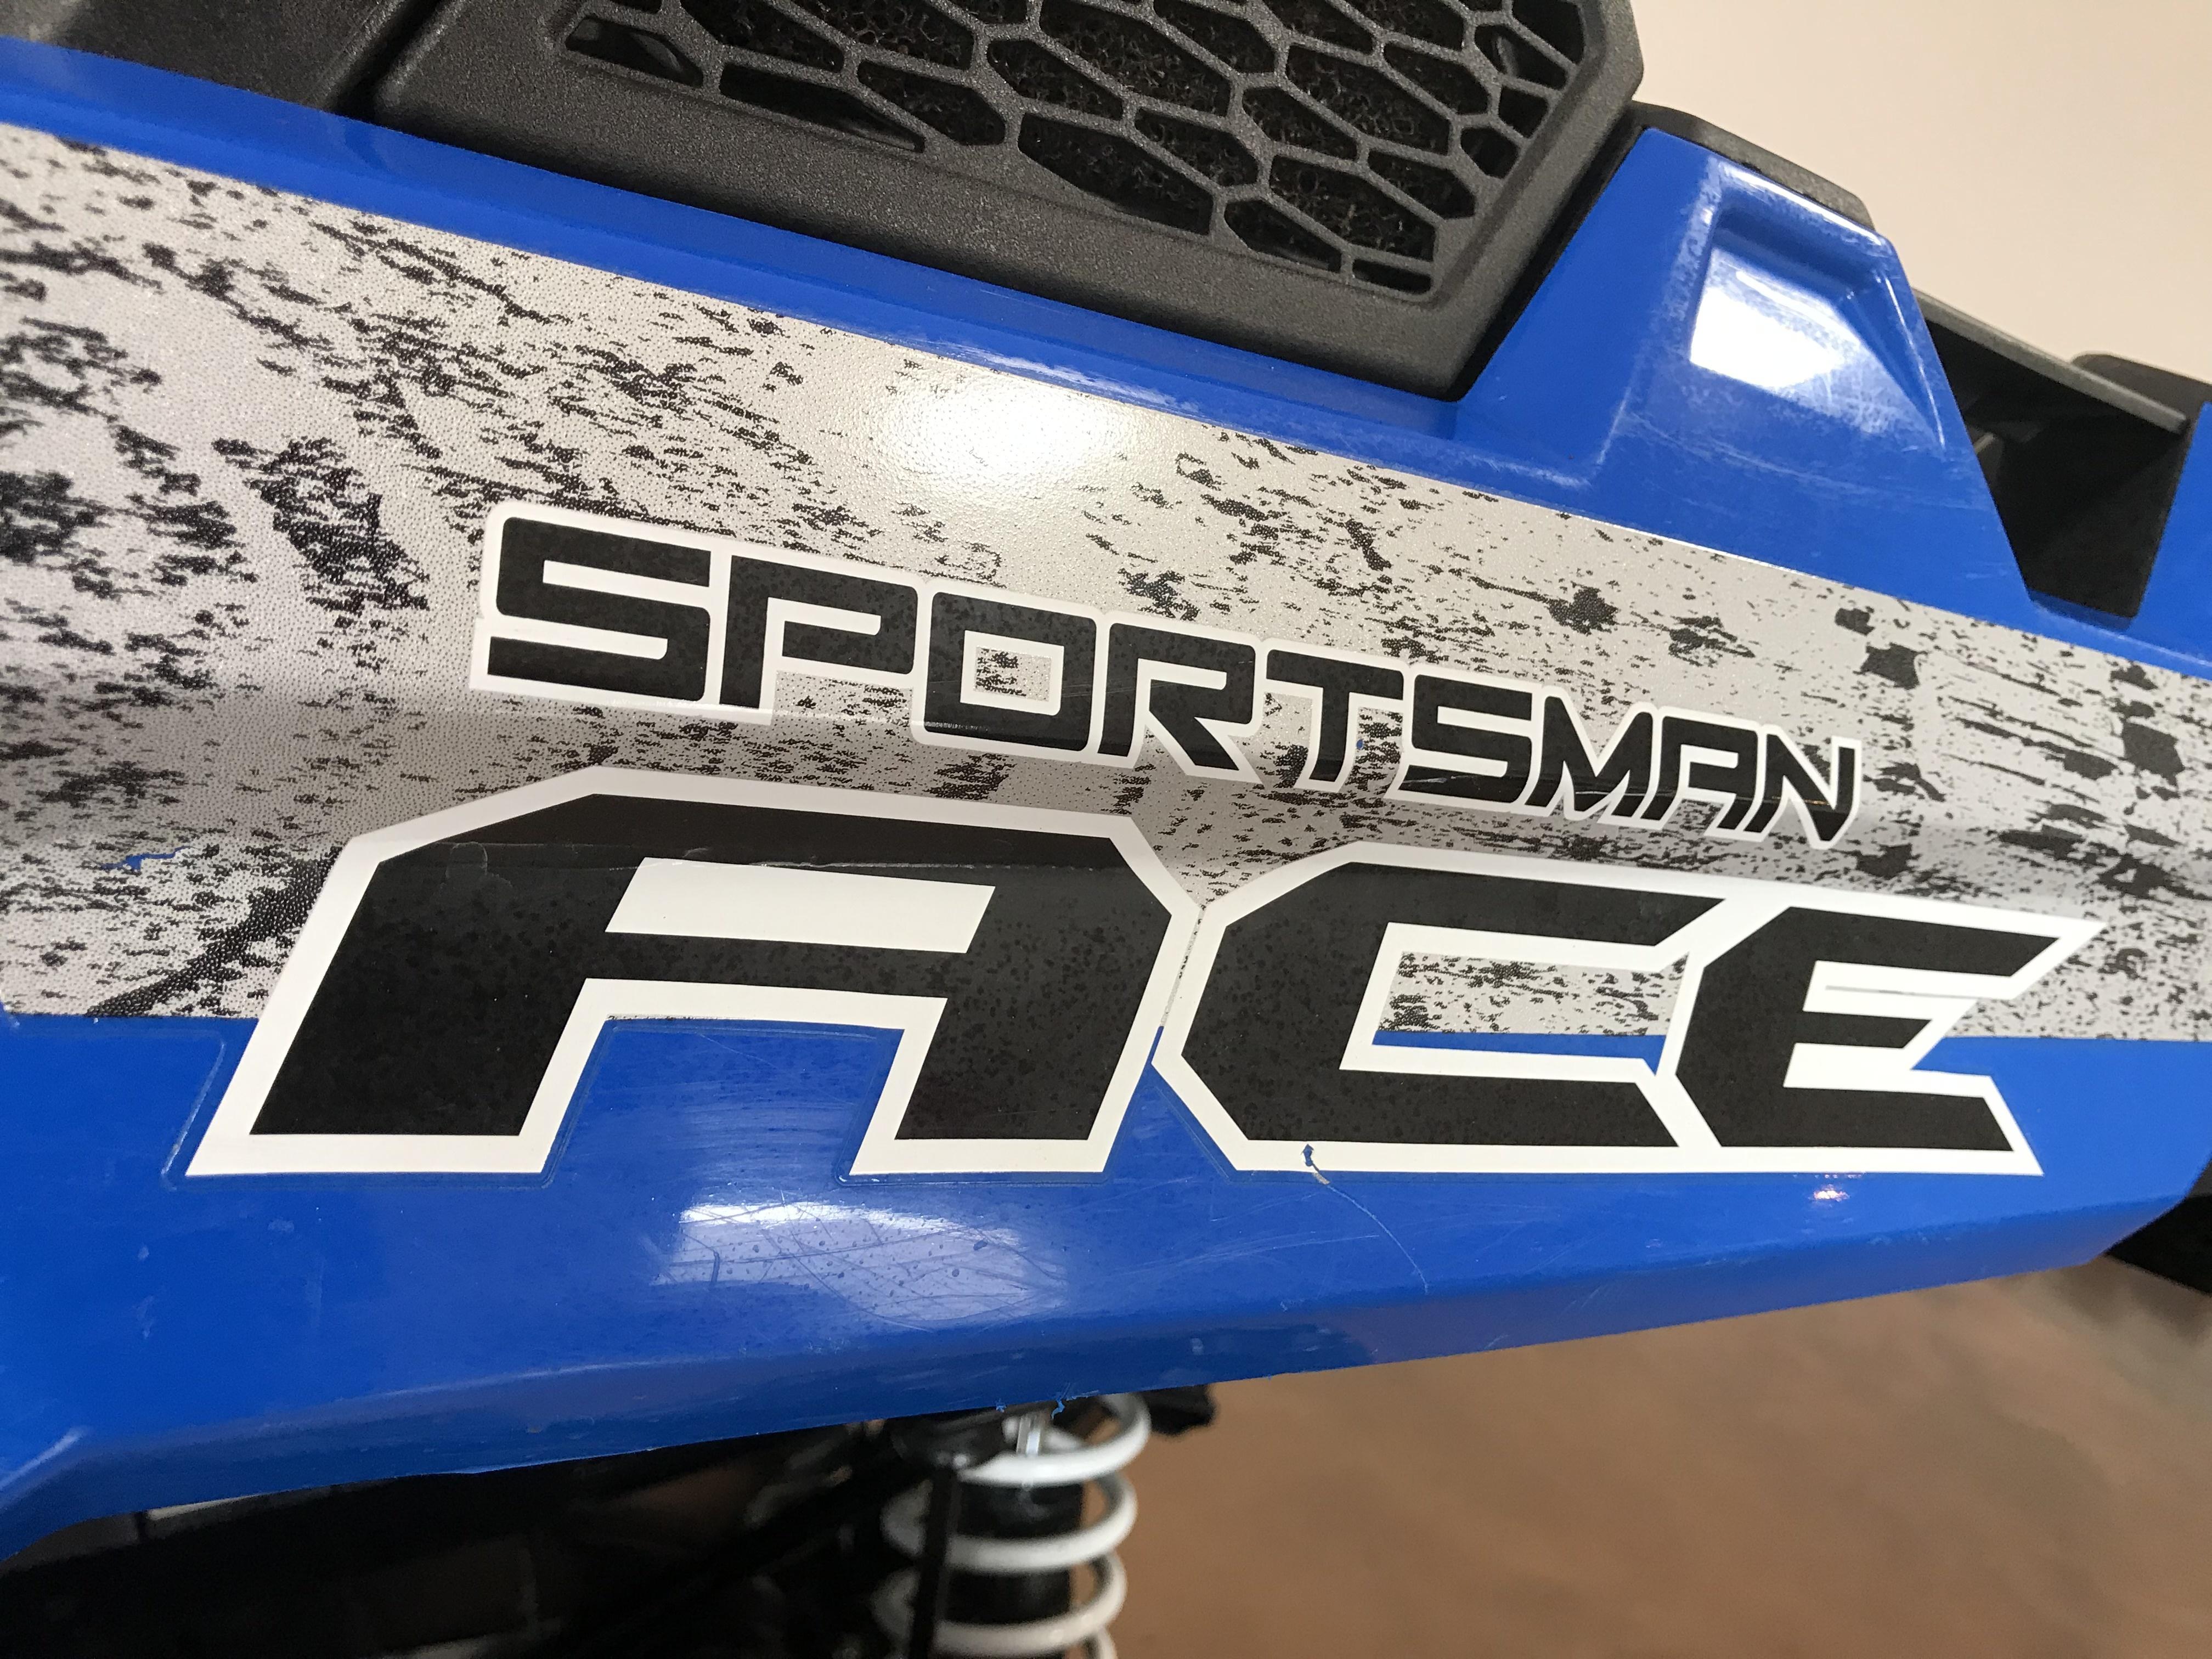 2015 Polaris Sportsman Ace 570